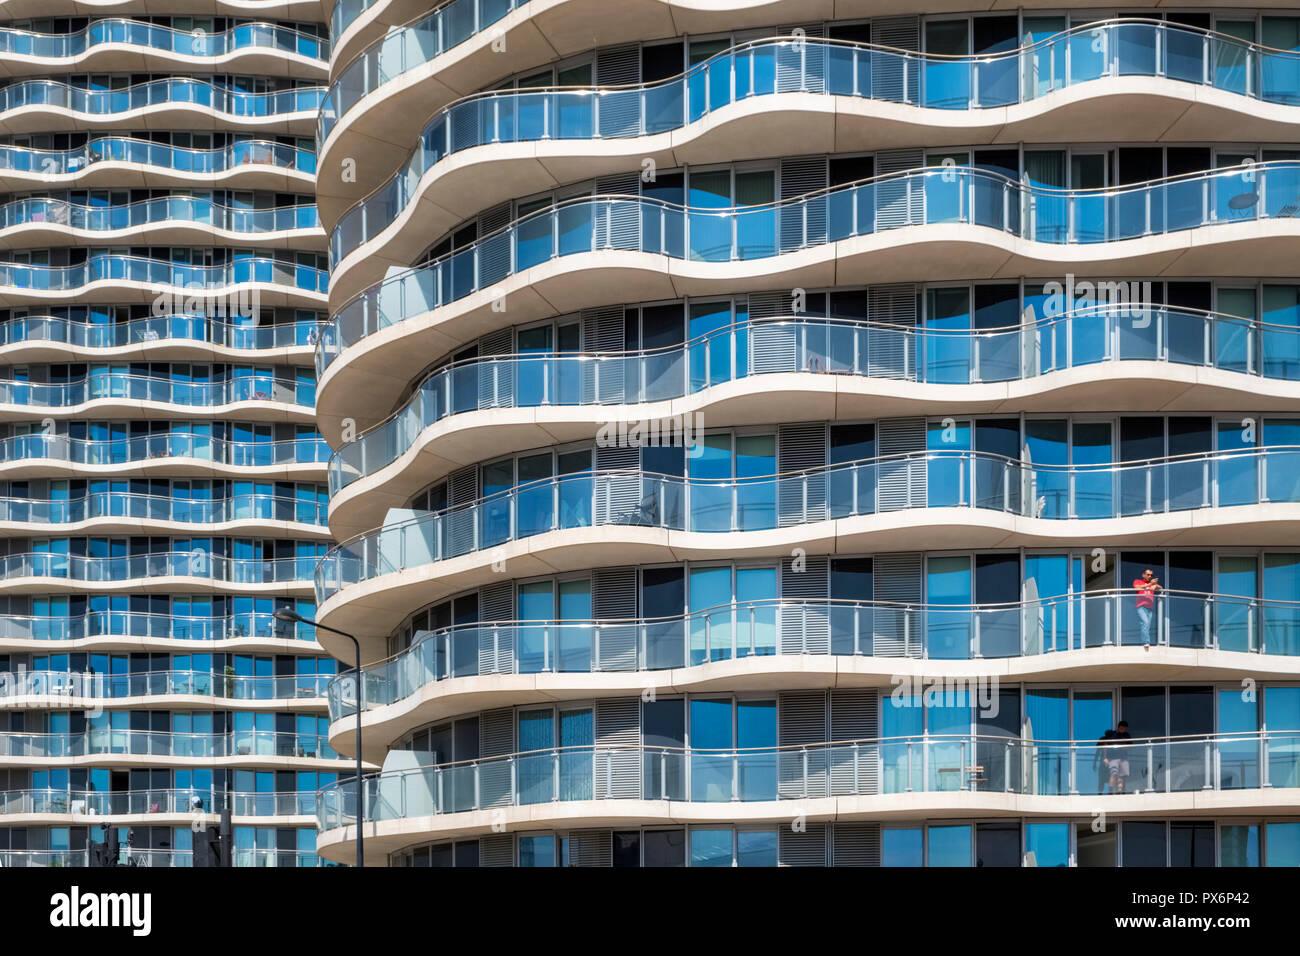 Detail der high-rise apartment Gebäude am Royal Victoria Dock, London, England, UK, moderne Architektur Stockbild